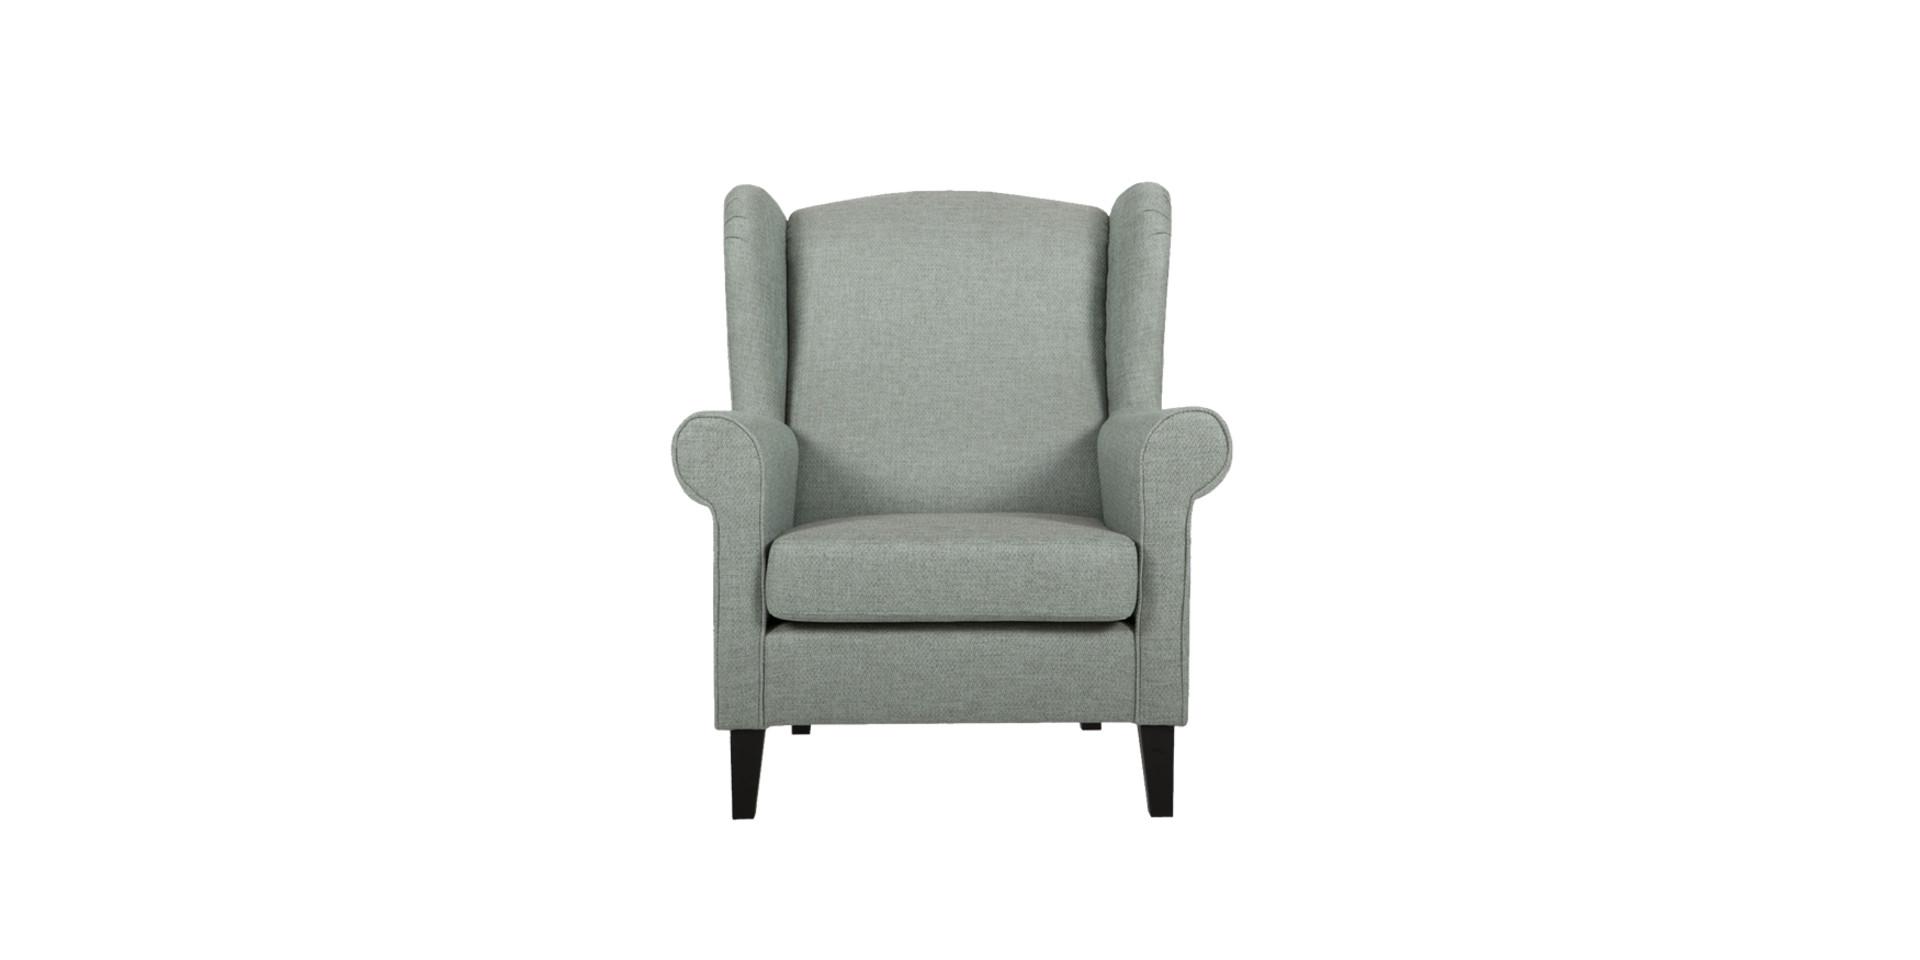 sits-watson-fauteuil-armchair_himalaya7_green_1